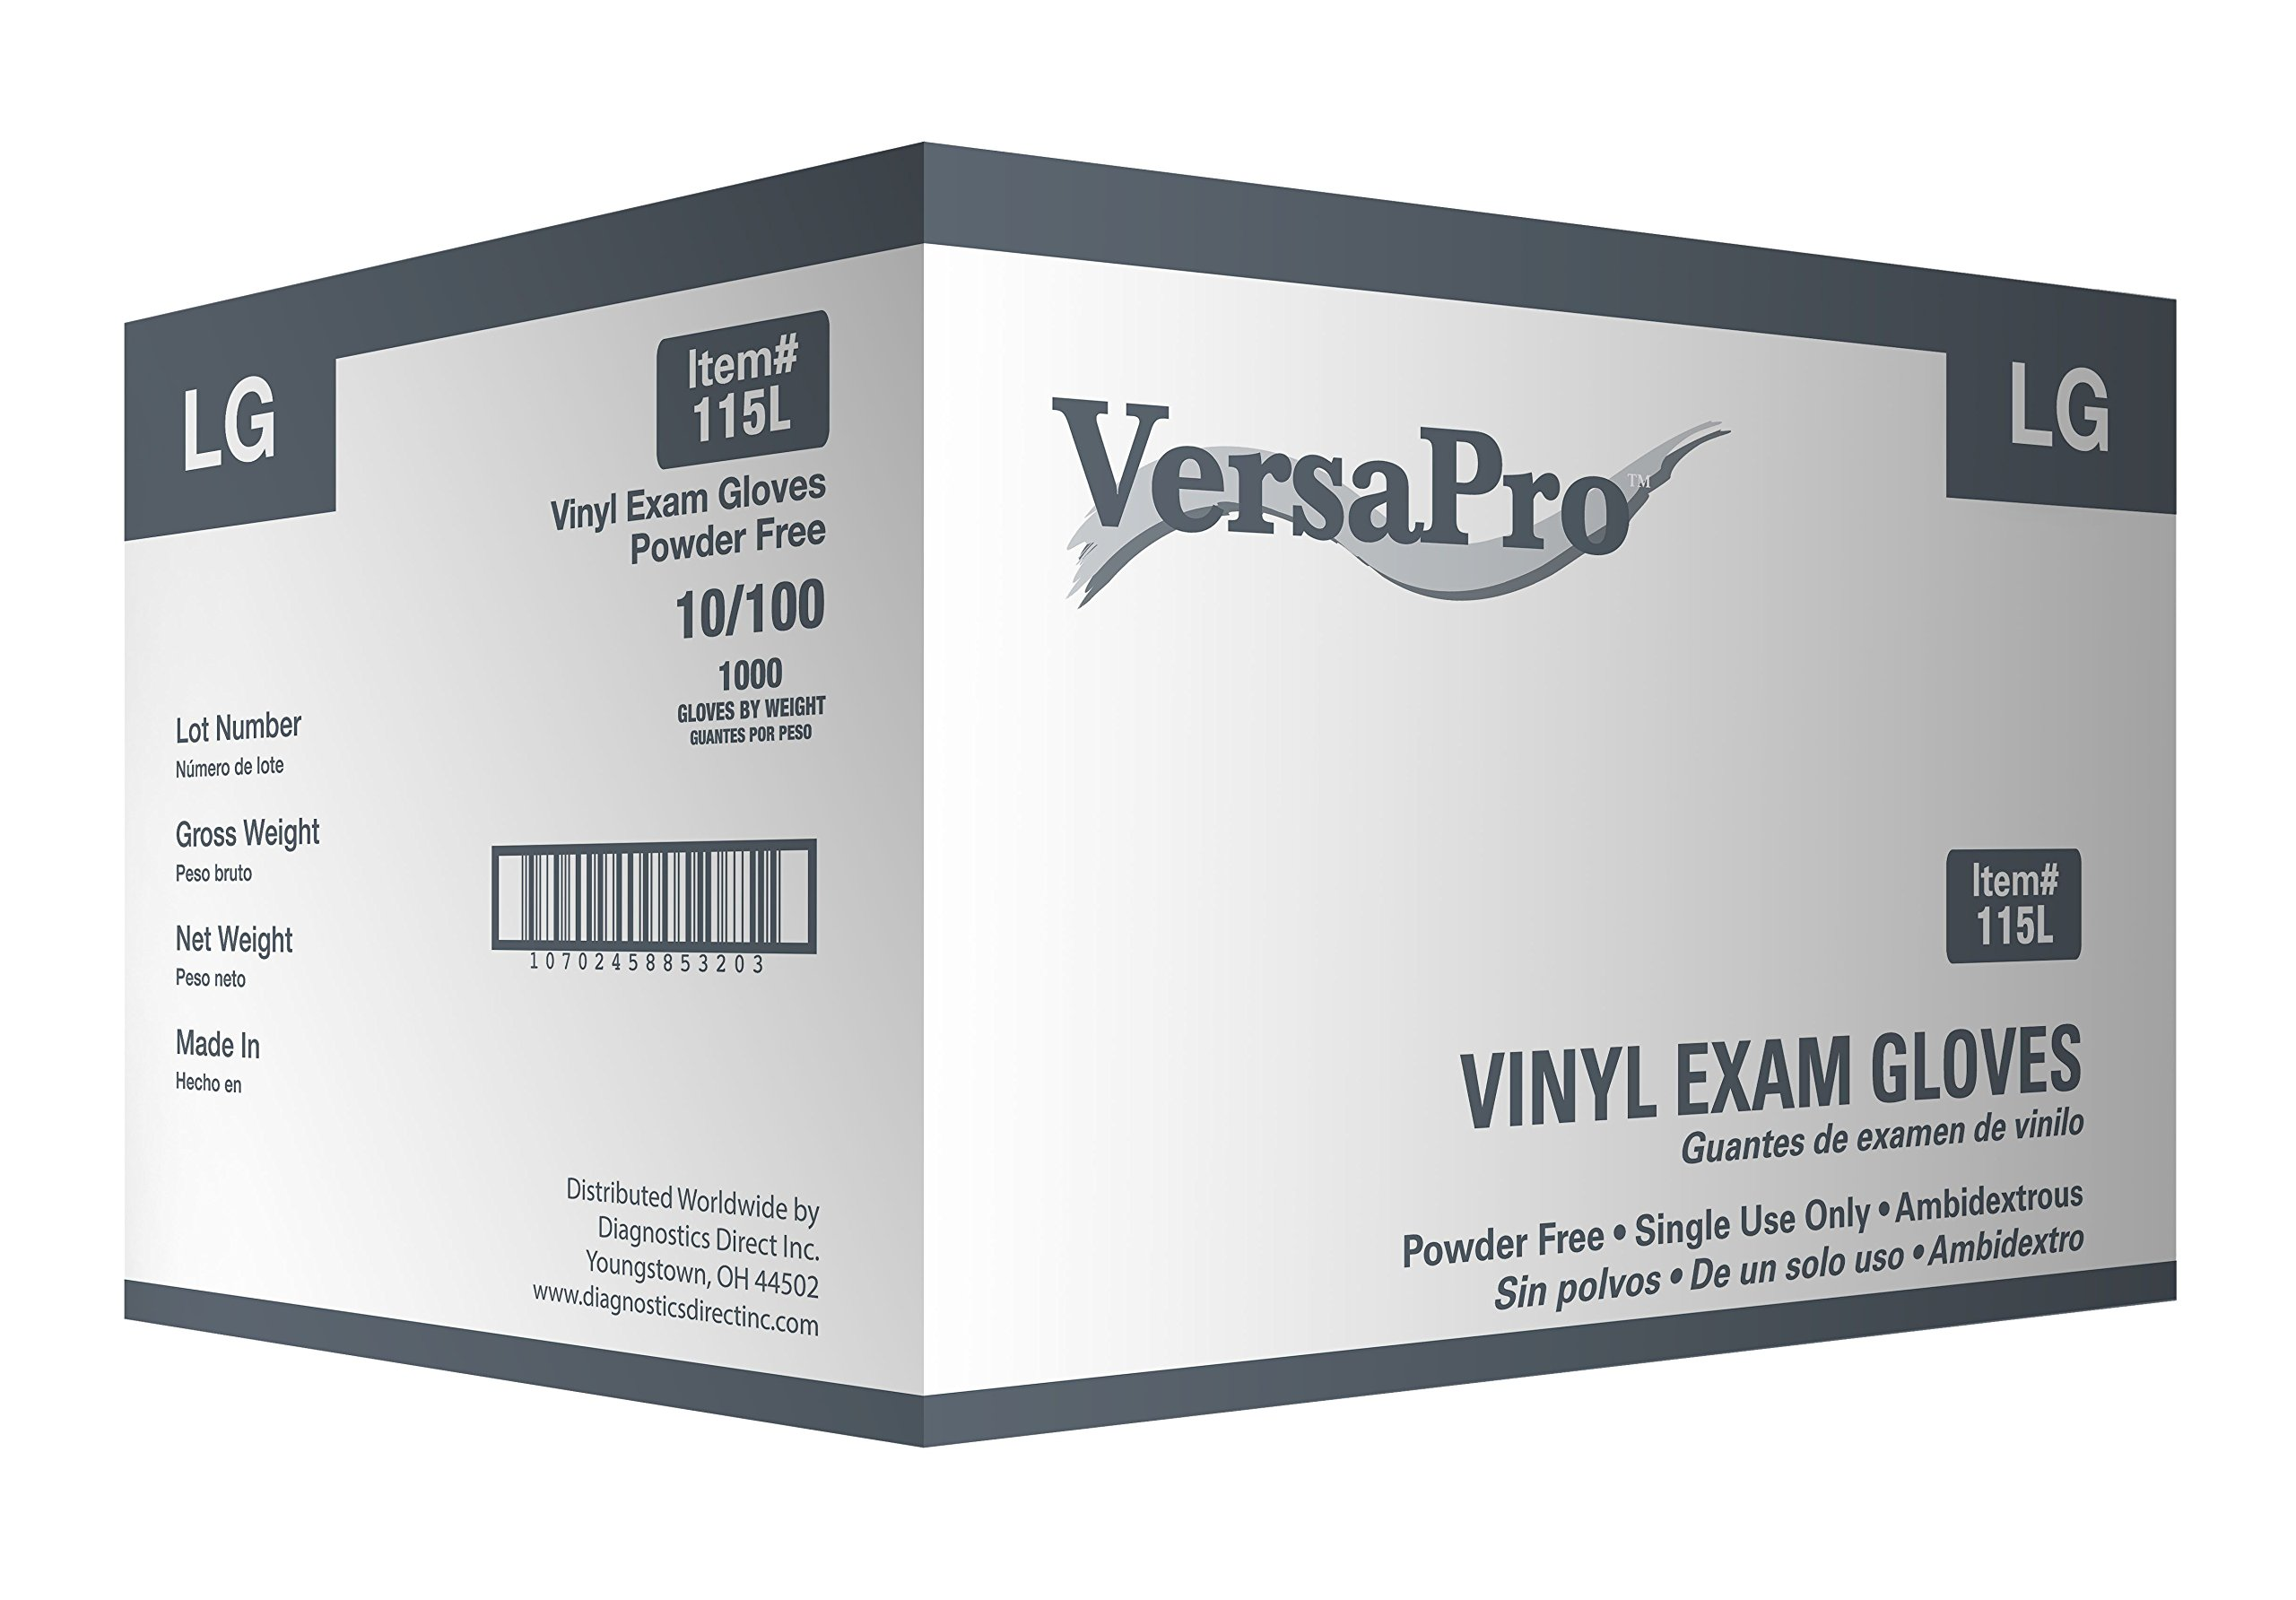 VersaPro 115L1000 Vinyl Exam Gloves, Powder-Free, Large (Pack of 1000)